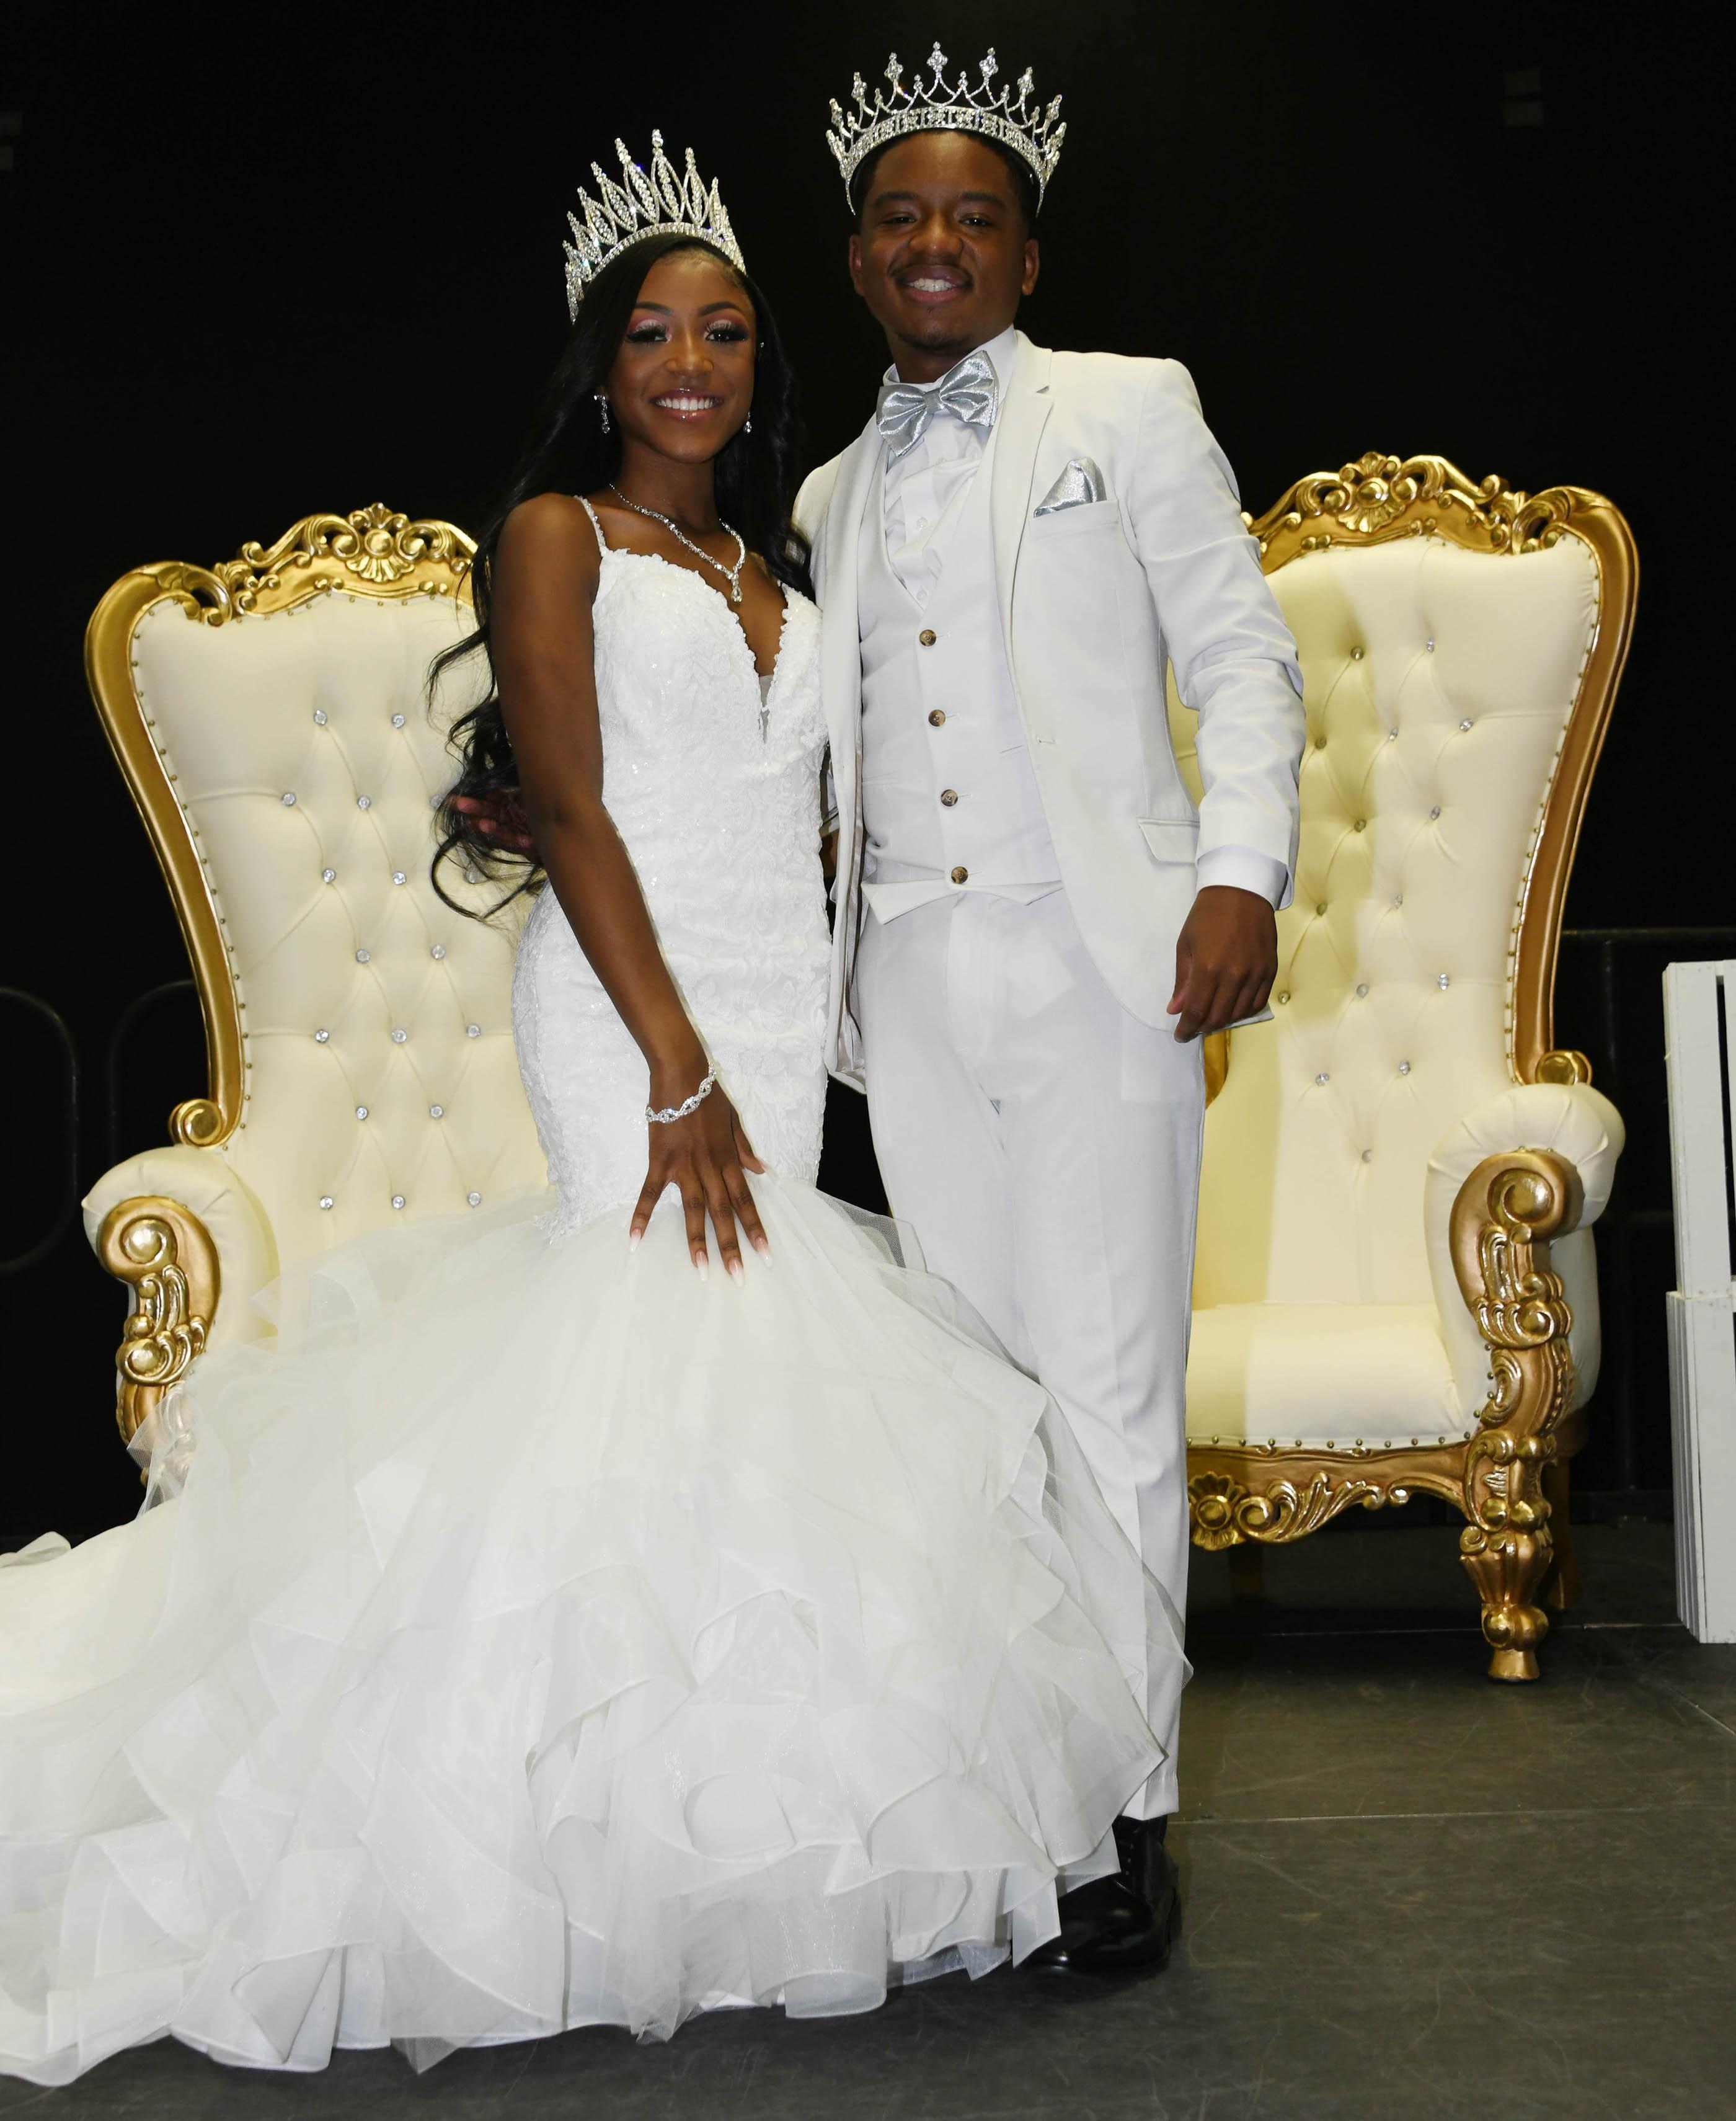 2020-21 Mr. and Miss DSU -- Ashlee Davis and Christian Chapman